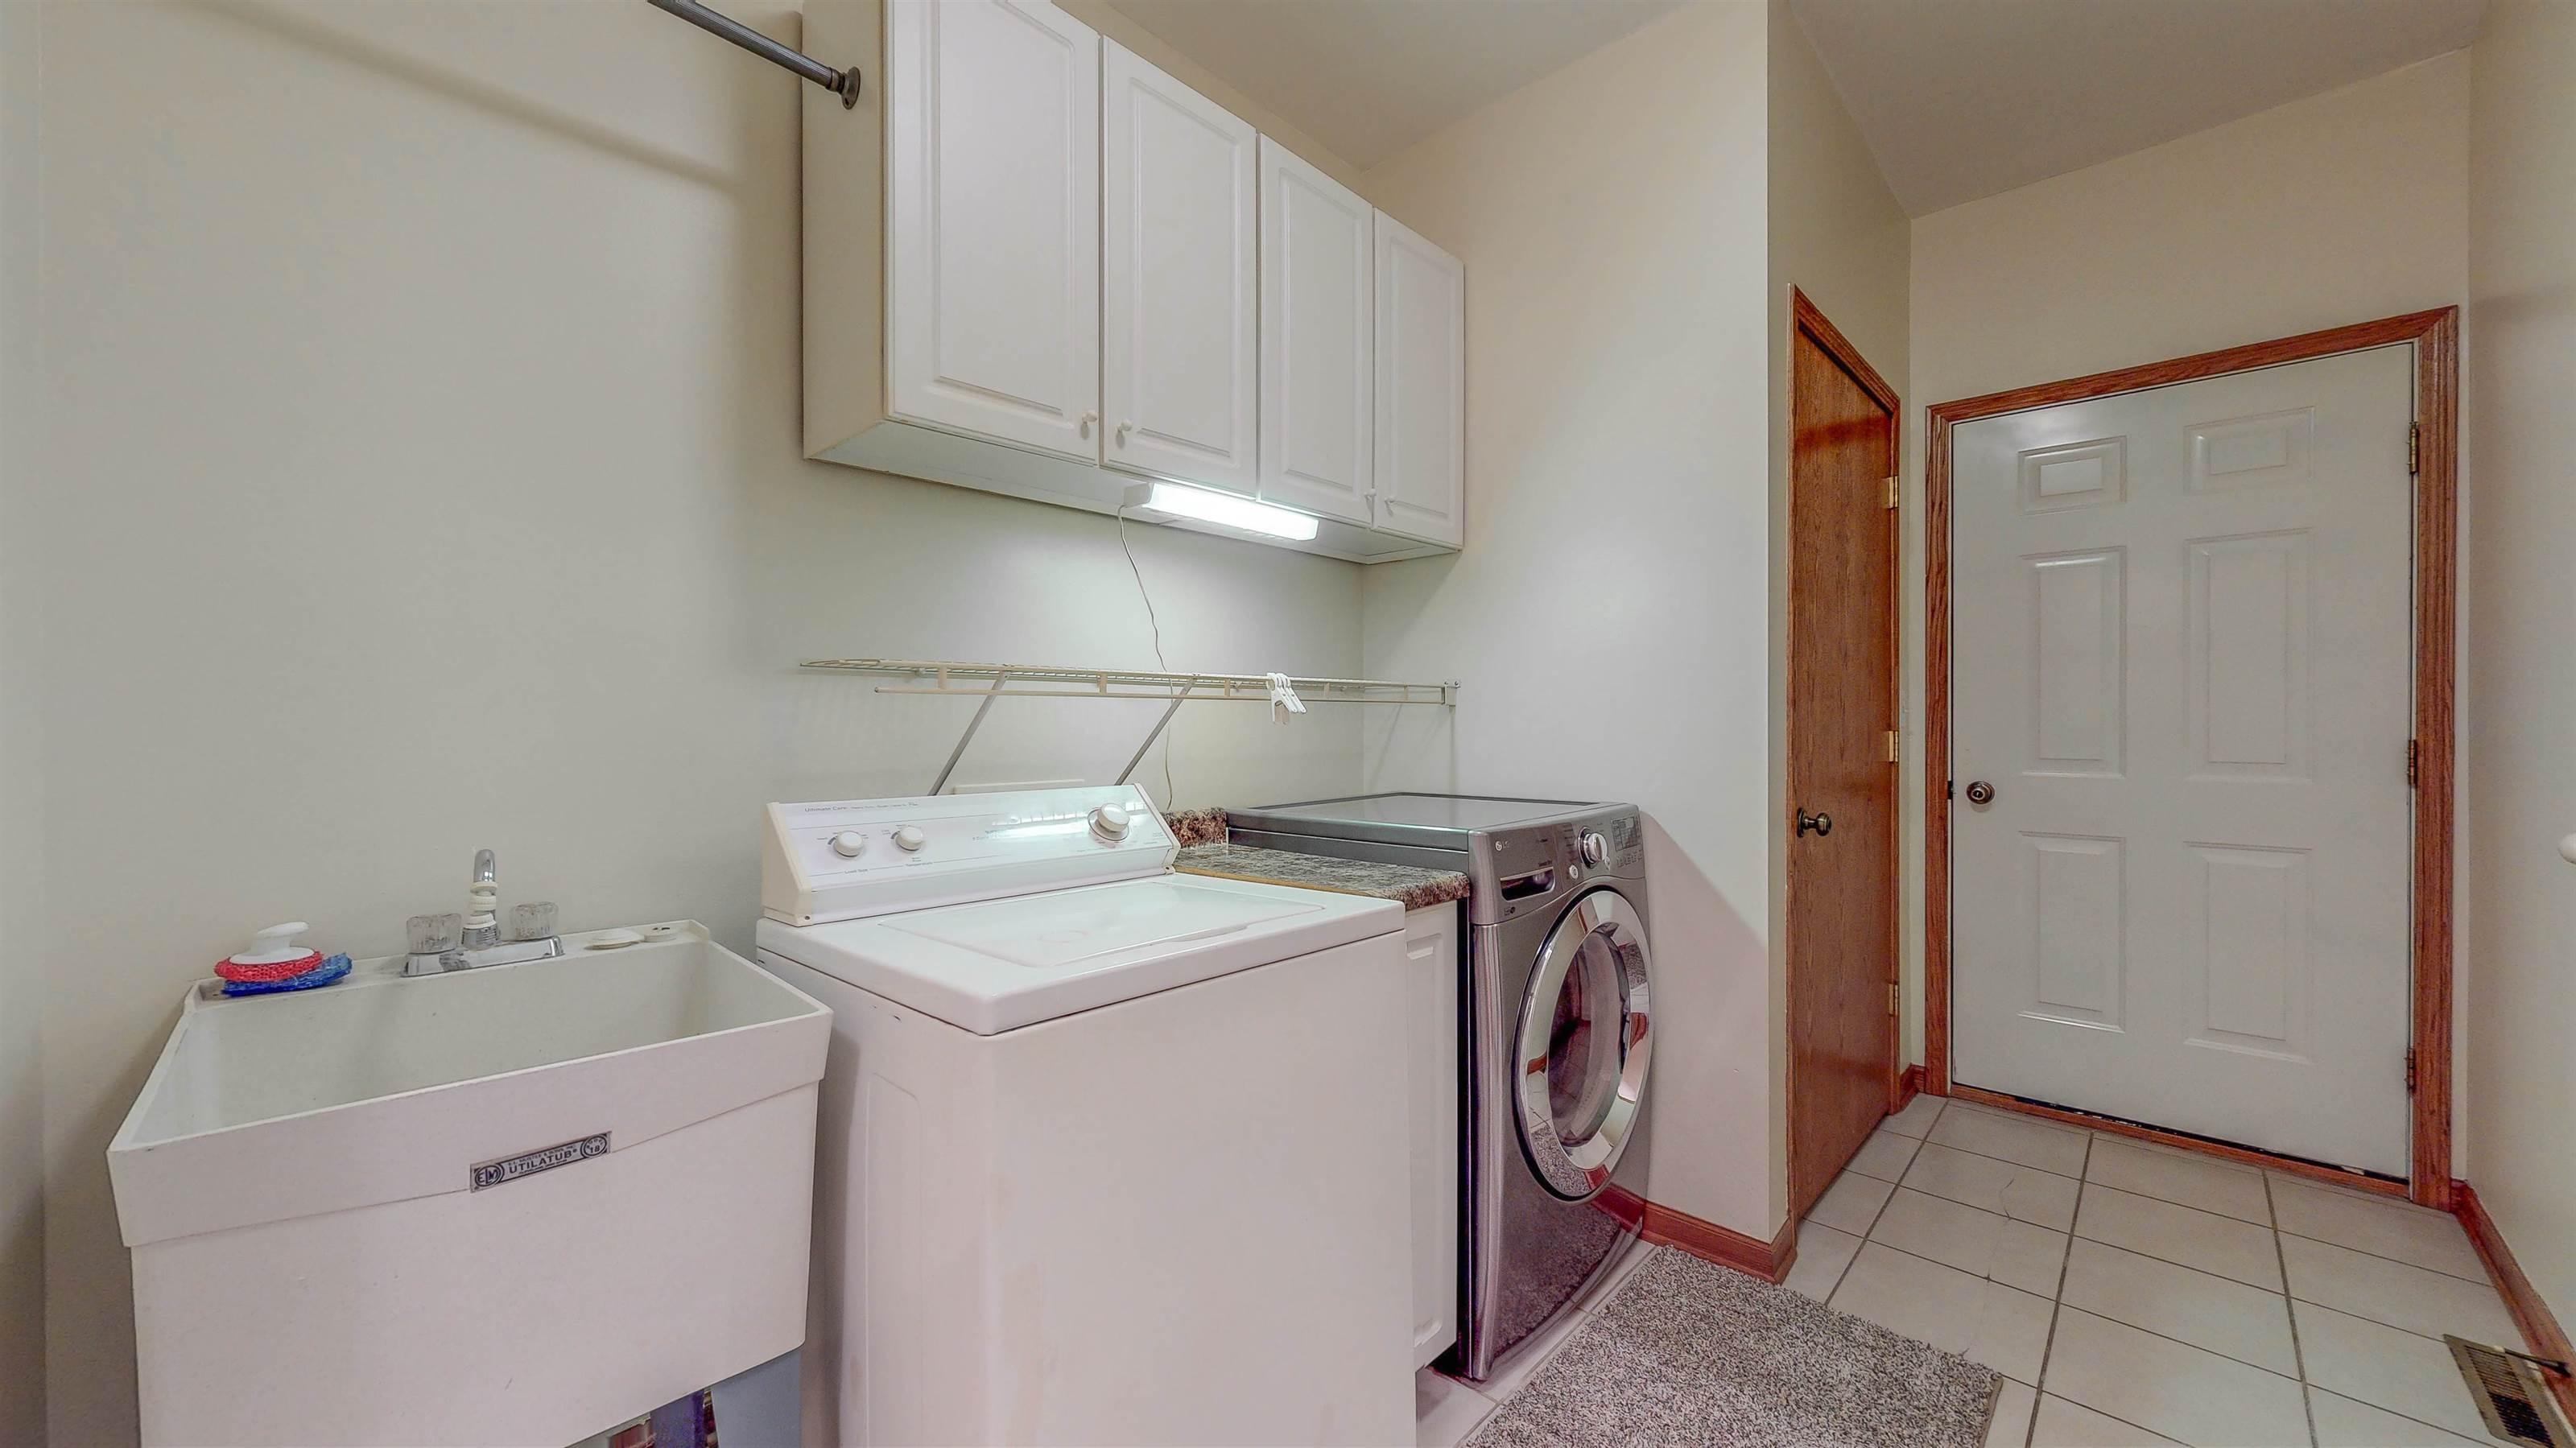 302 North Spruce Street, Manteno, IL 60950